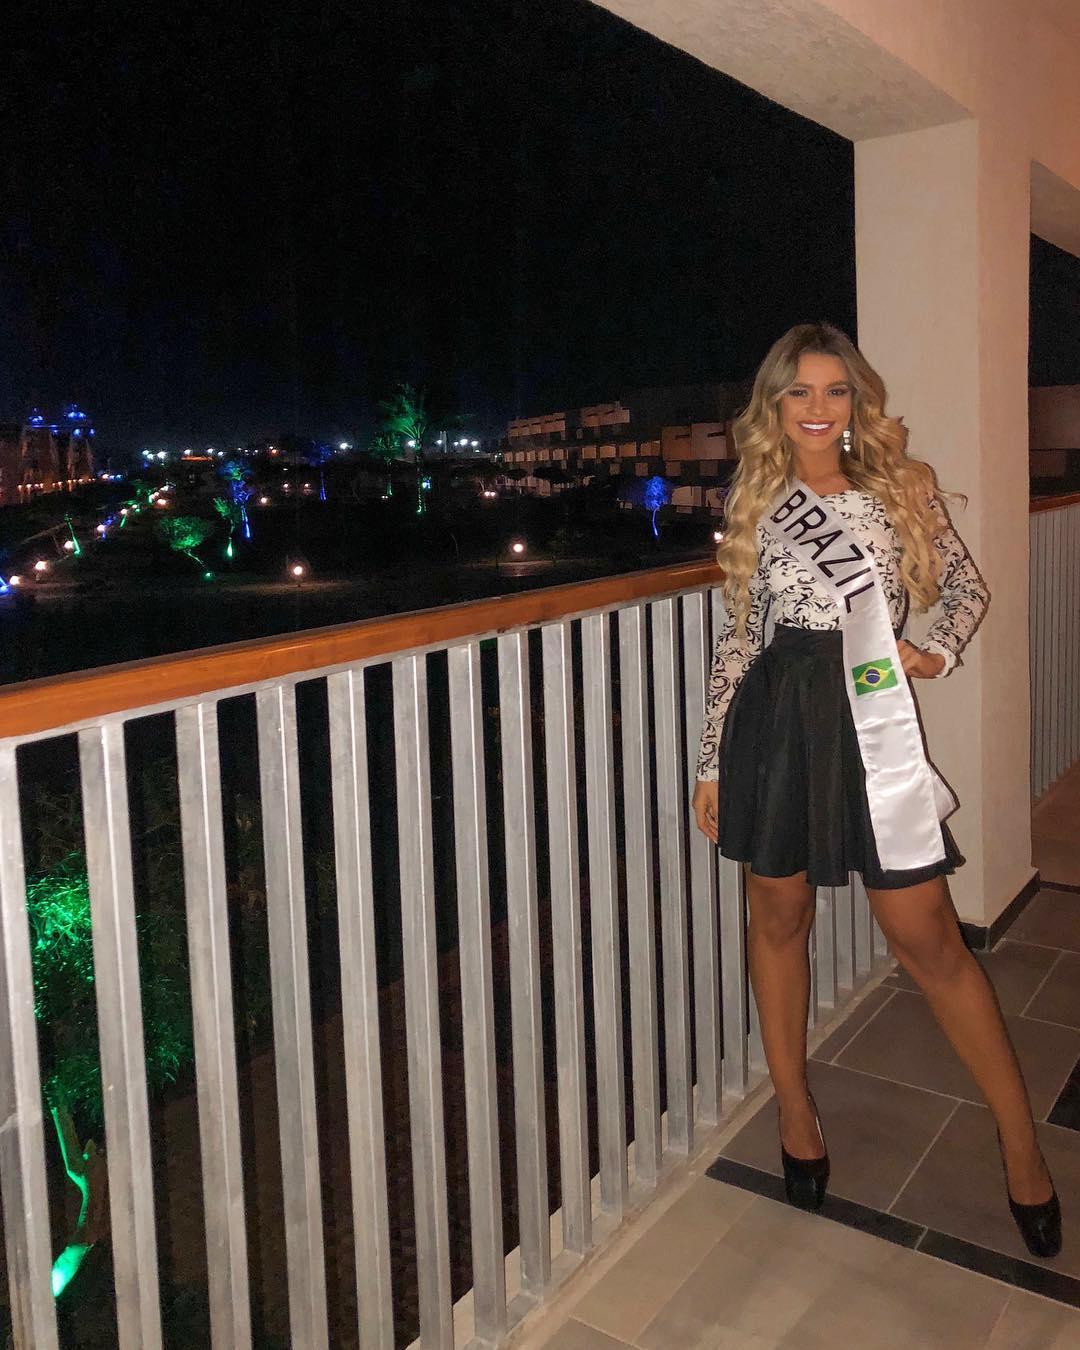 amanda cardoso, miss grand espirito santo 2019/3rd runner-up de miss intercontinental 2017. - Página 2 26294621_193146424761090_5767956502308454400_n